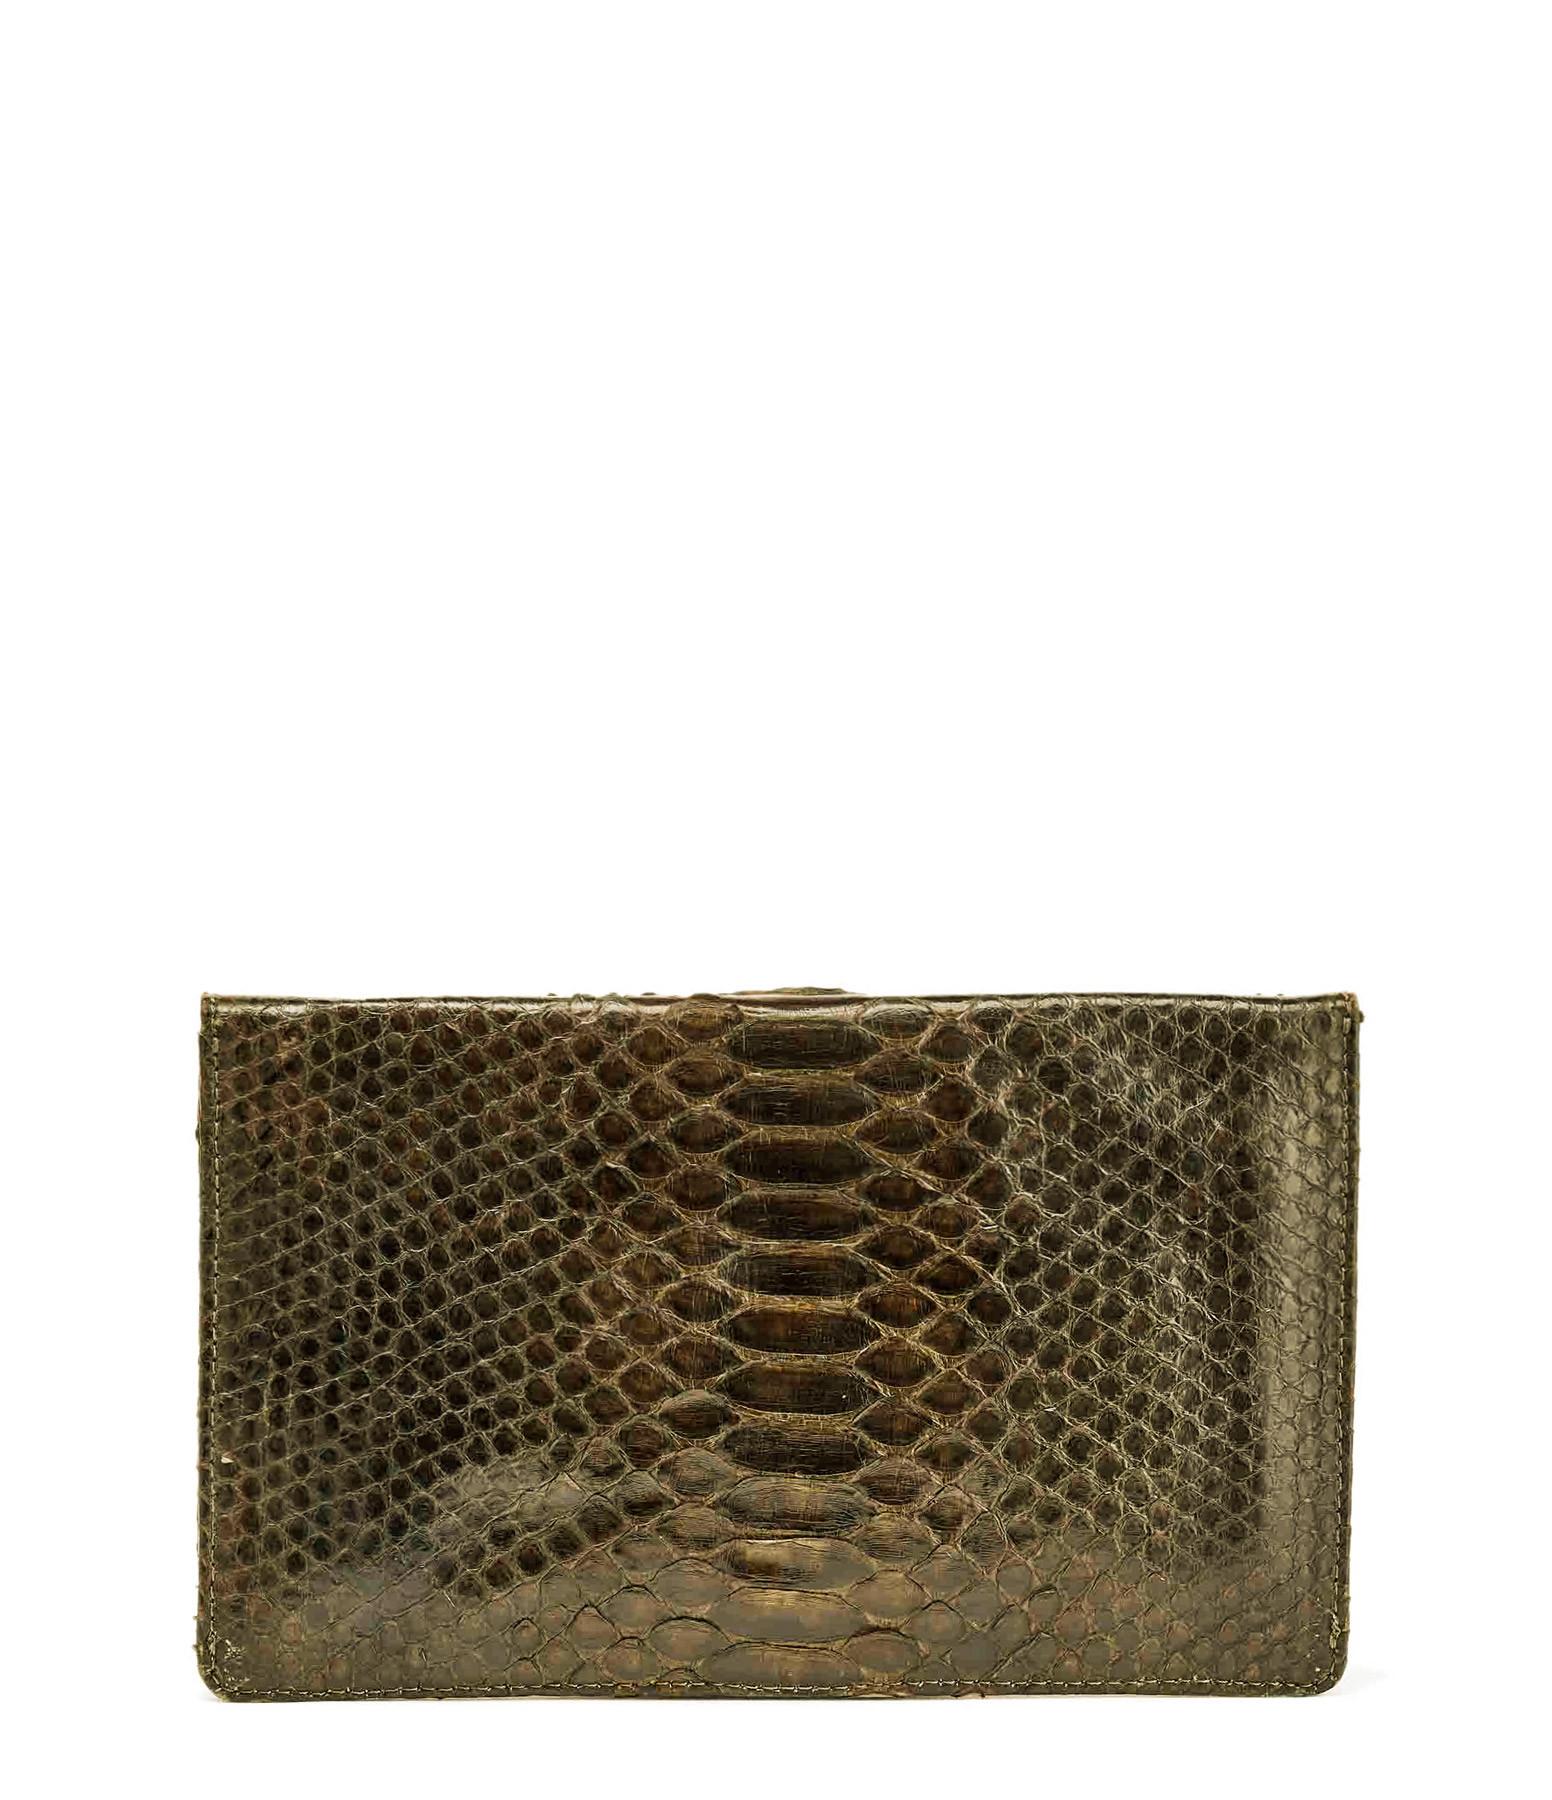 CLARIS VIROT - Pochette Big Alex Python Kaki